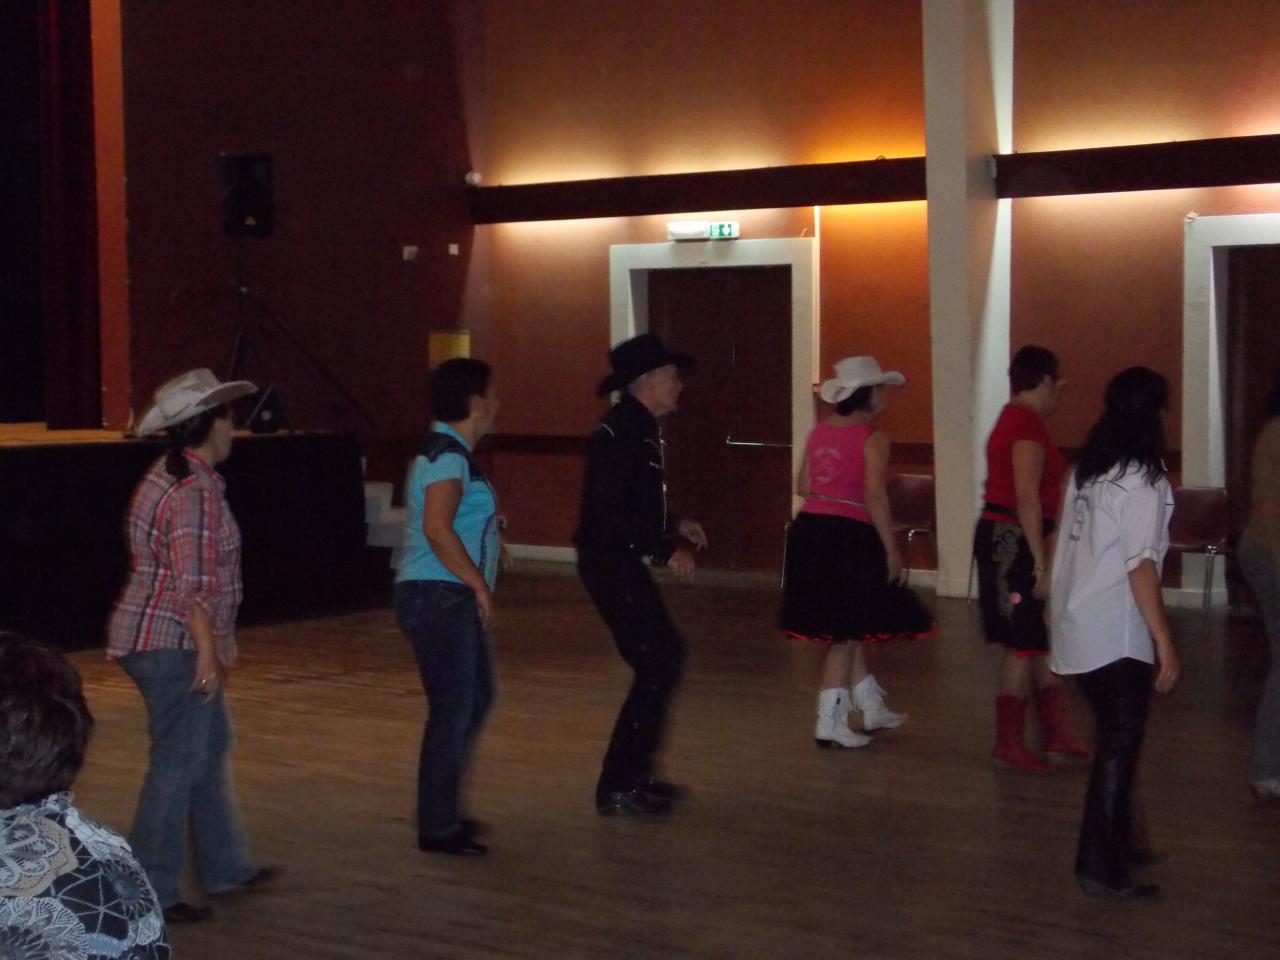 Bal chez les Rodeo Dancers Pauillac 1O/14